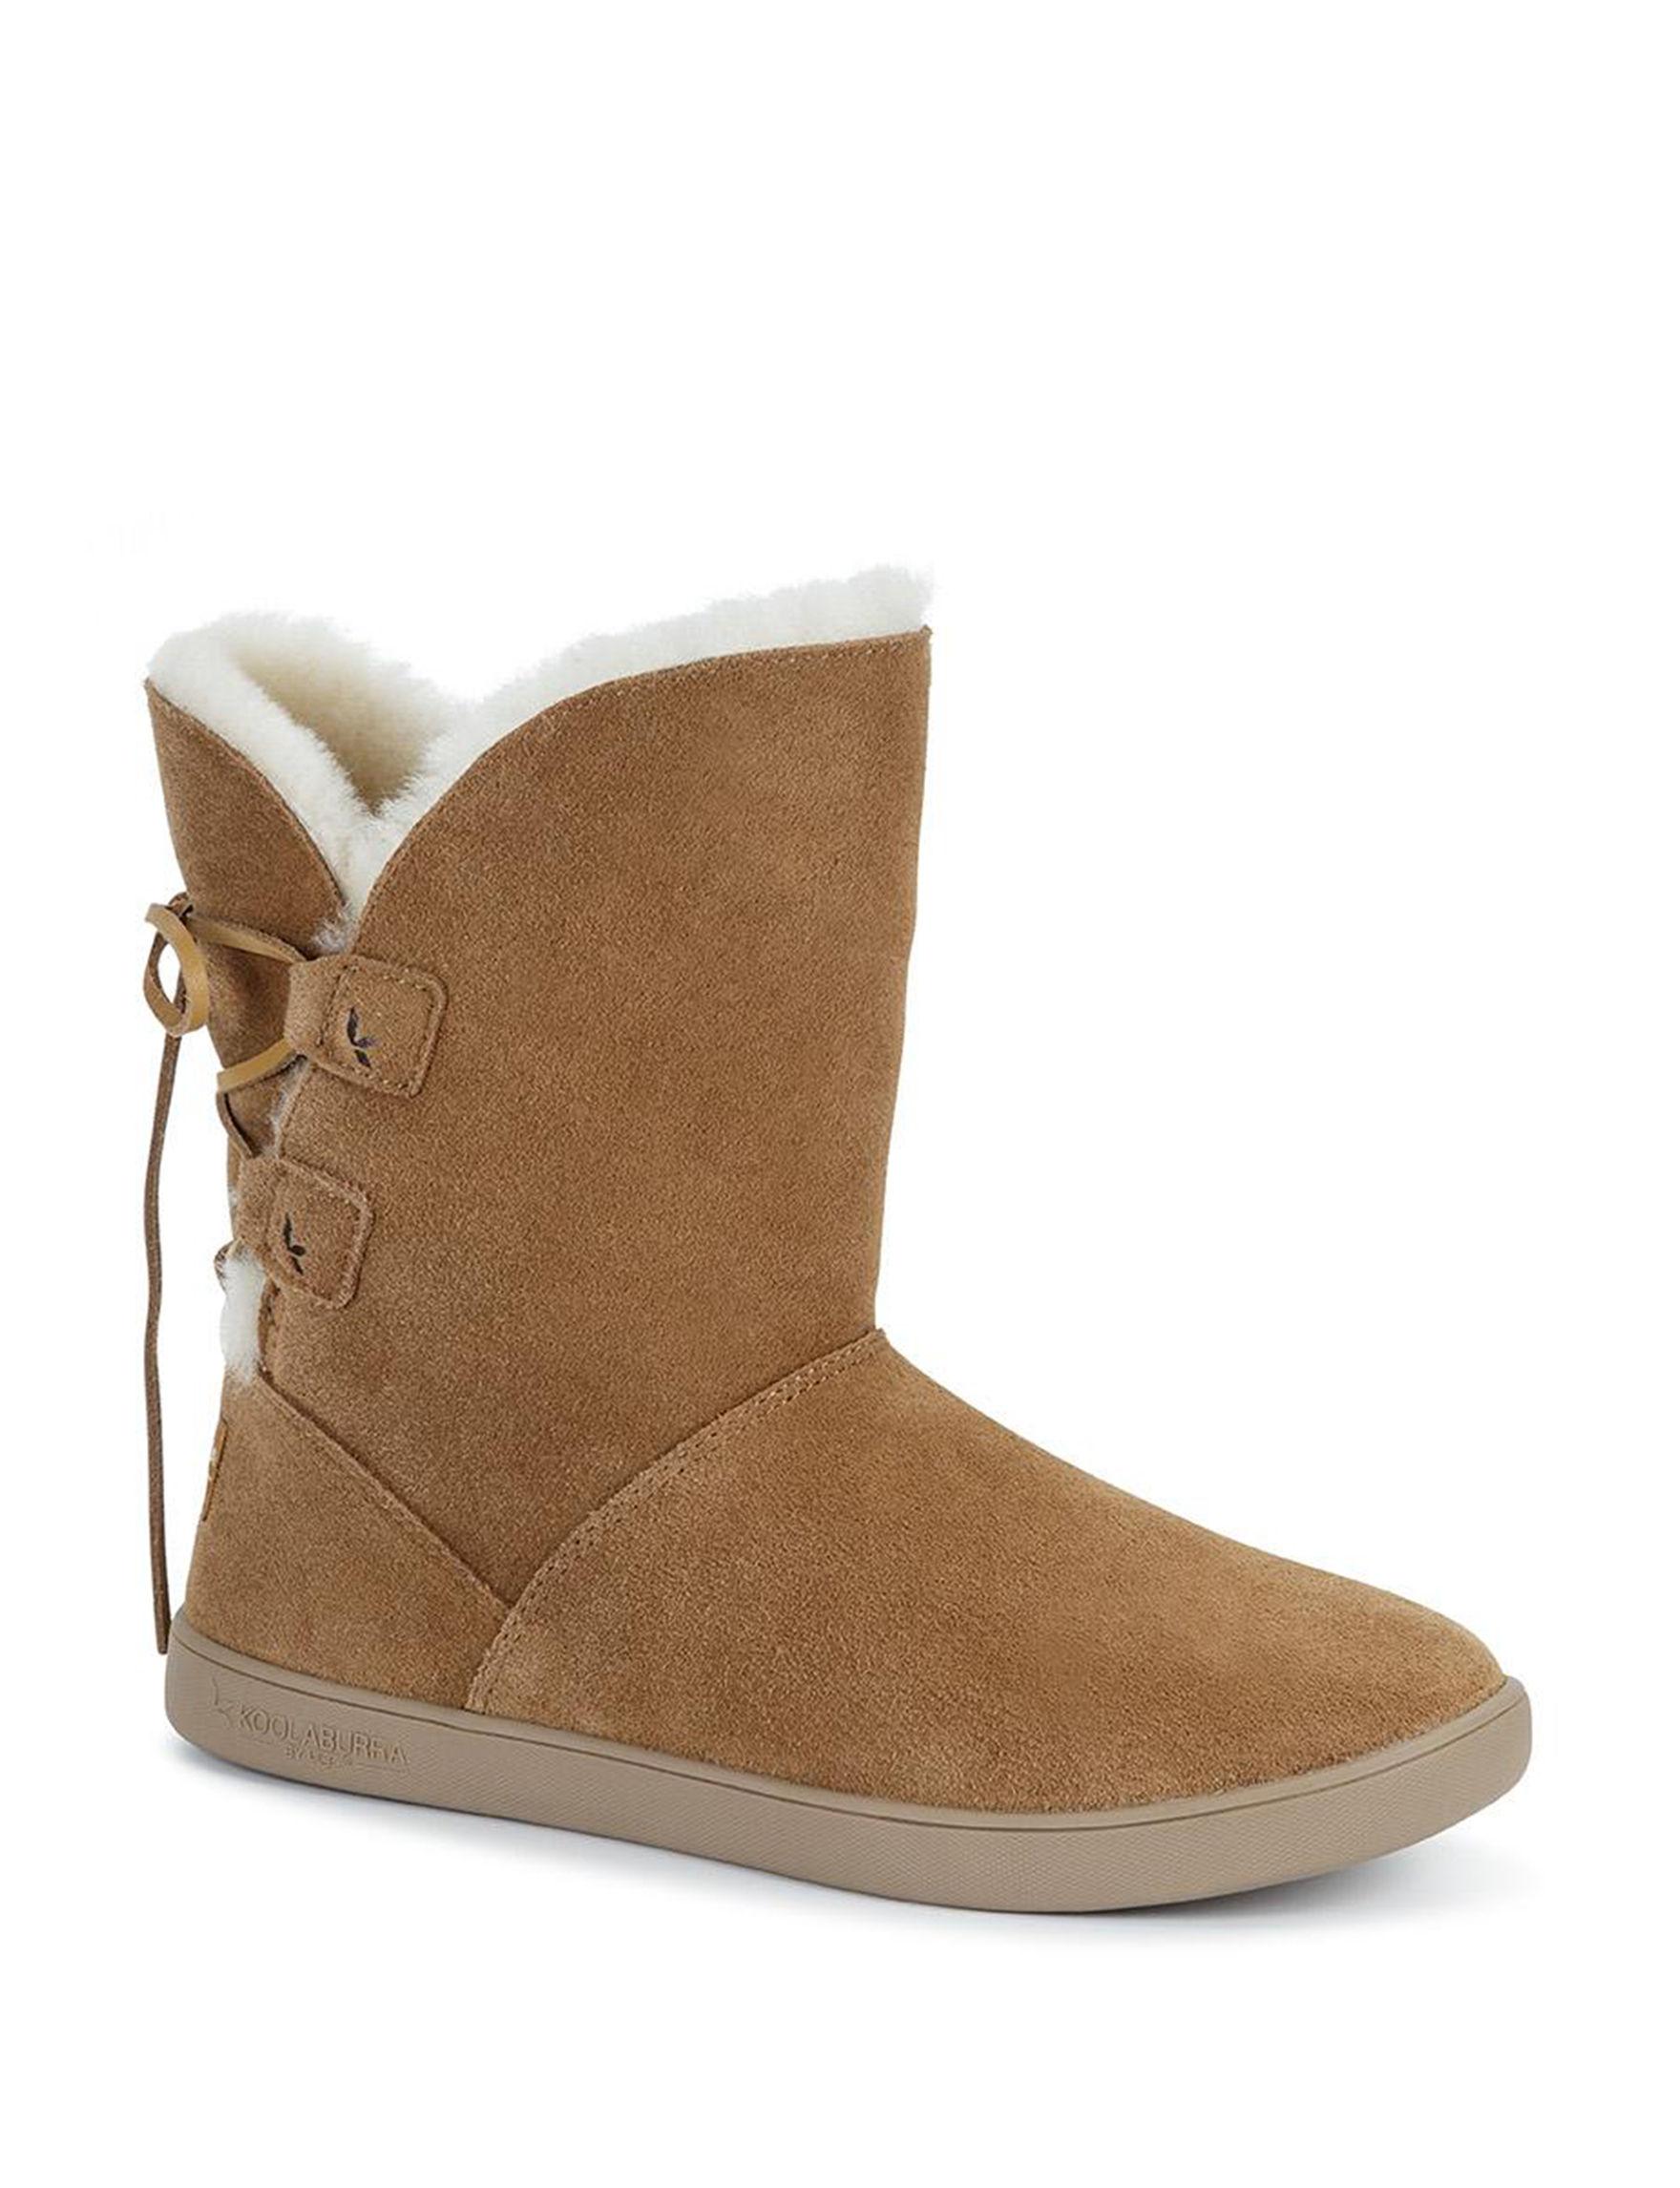 9264f640f5a Koolaburra by UGG Shazi Short Boots (Black or Brown) - Slickdeals.net